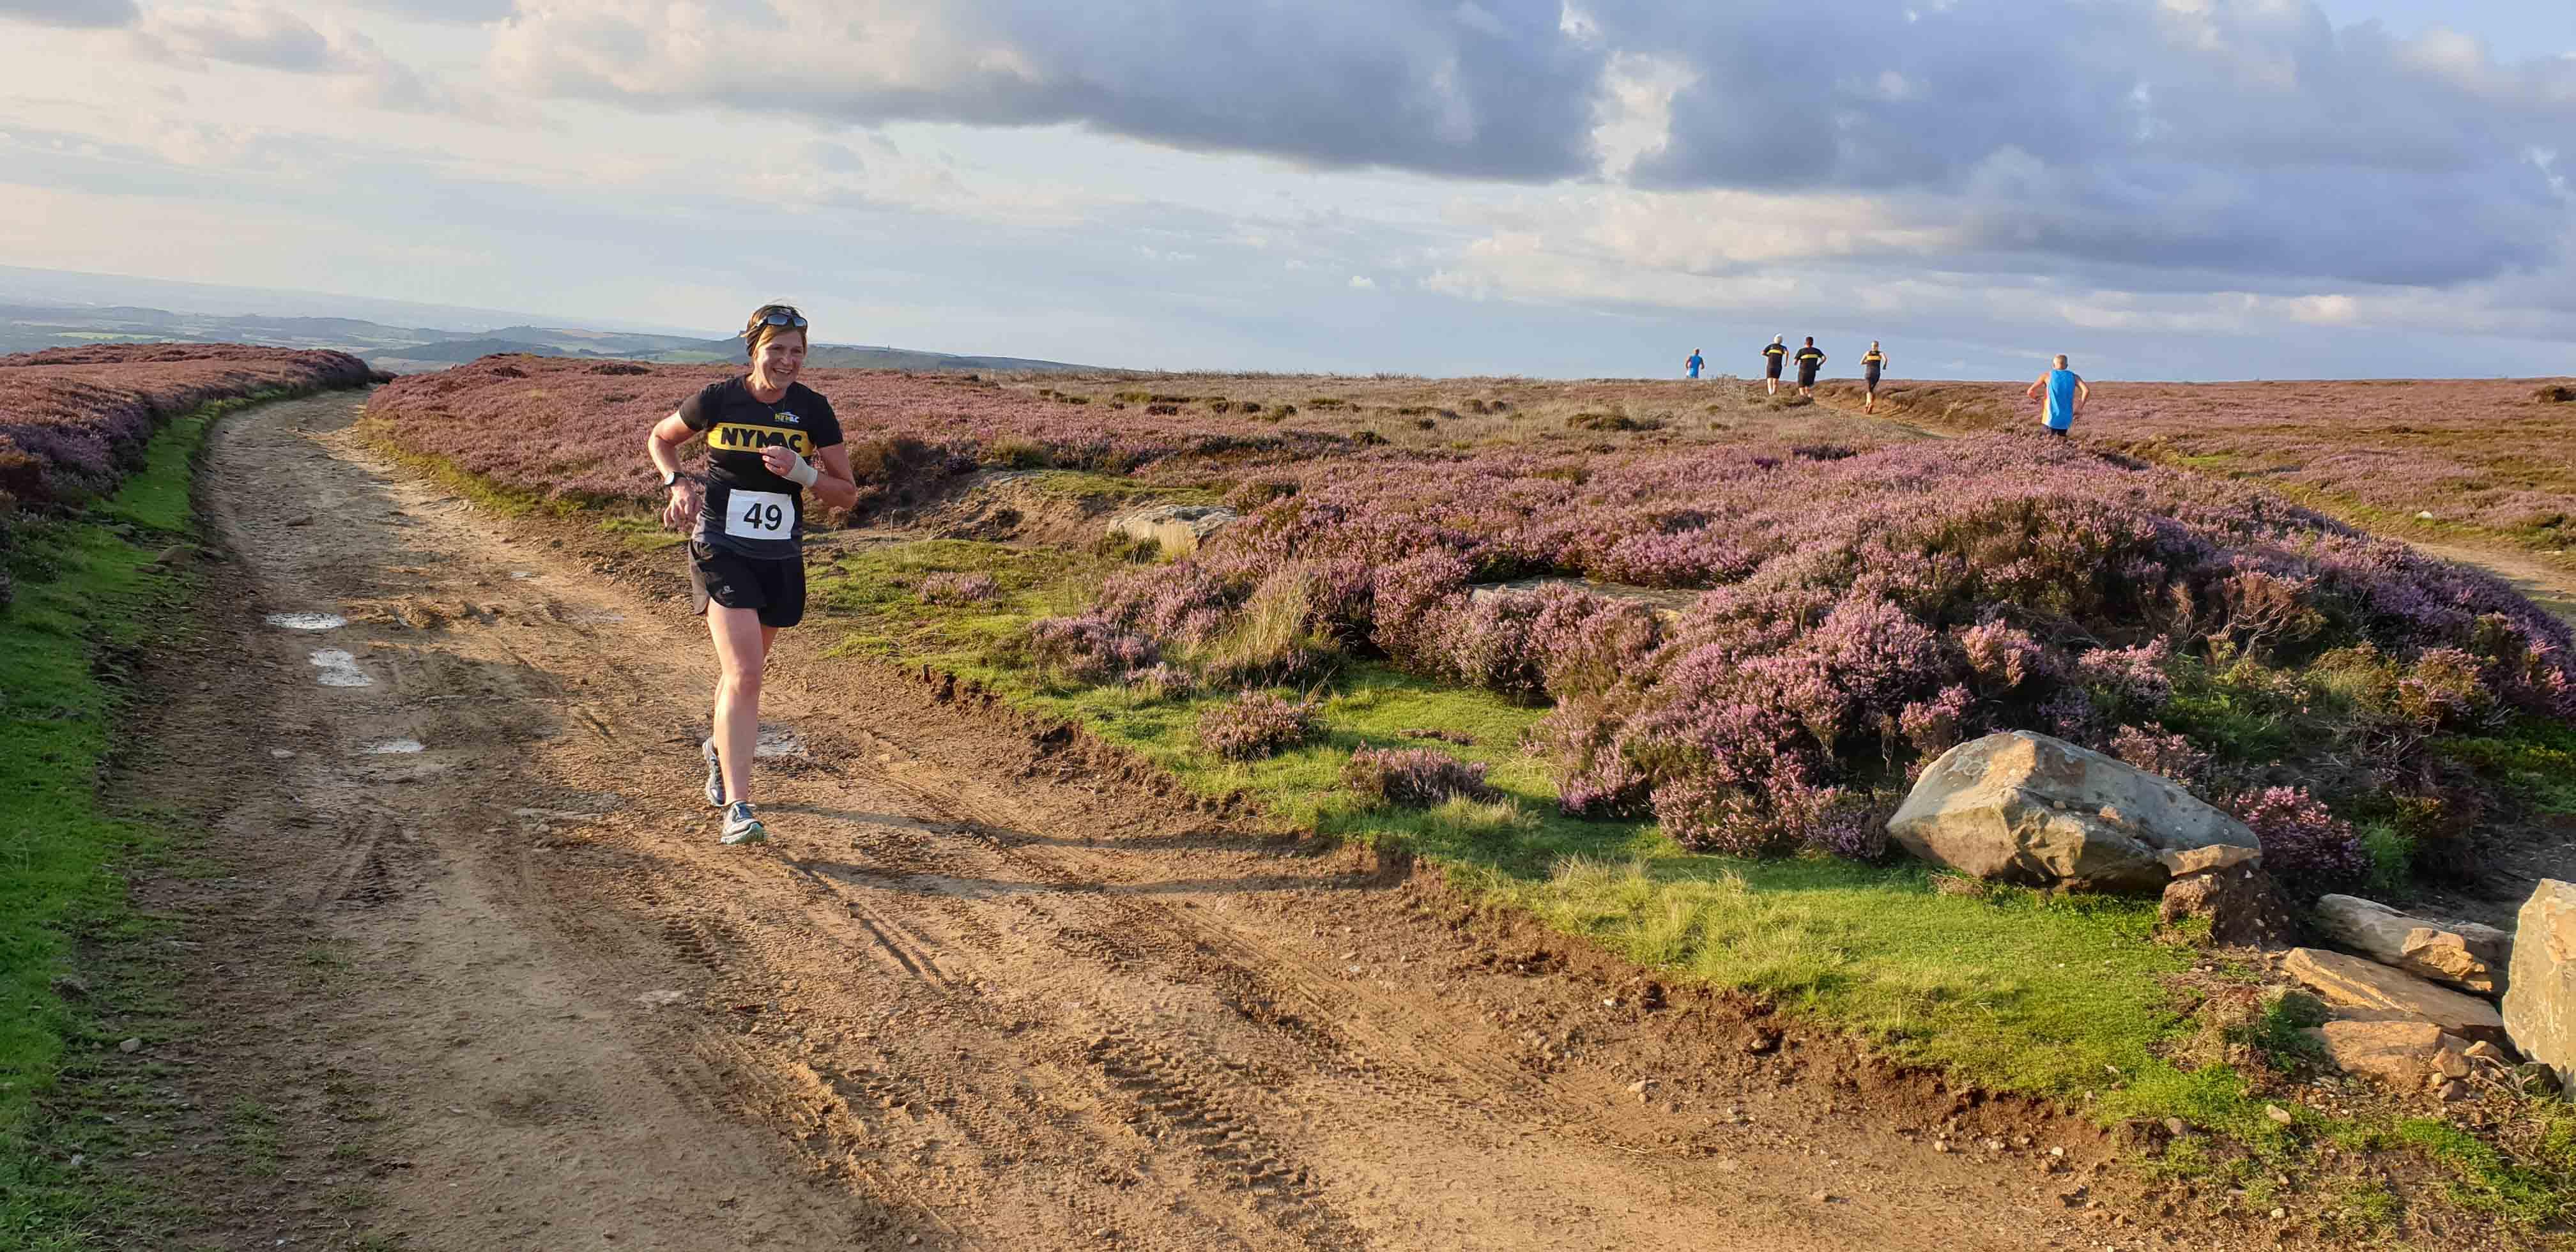 Aonach Mor Uphill Running Race Results | Off Beat Bikes